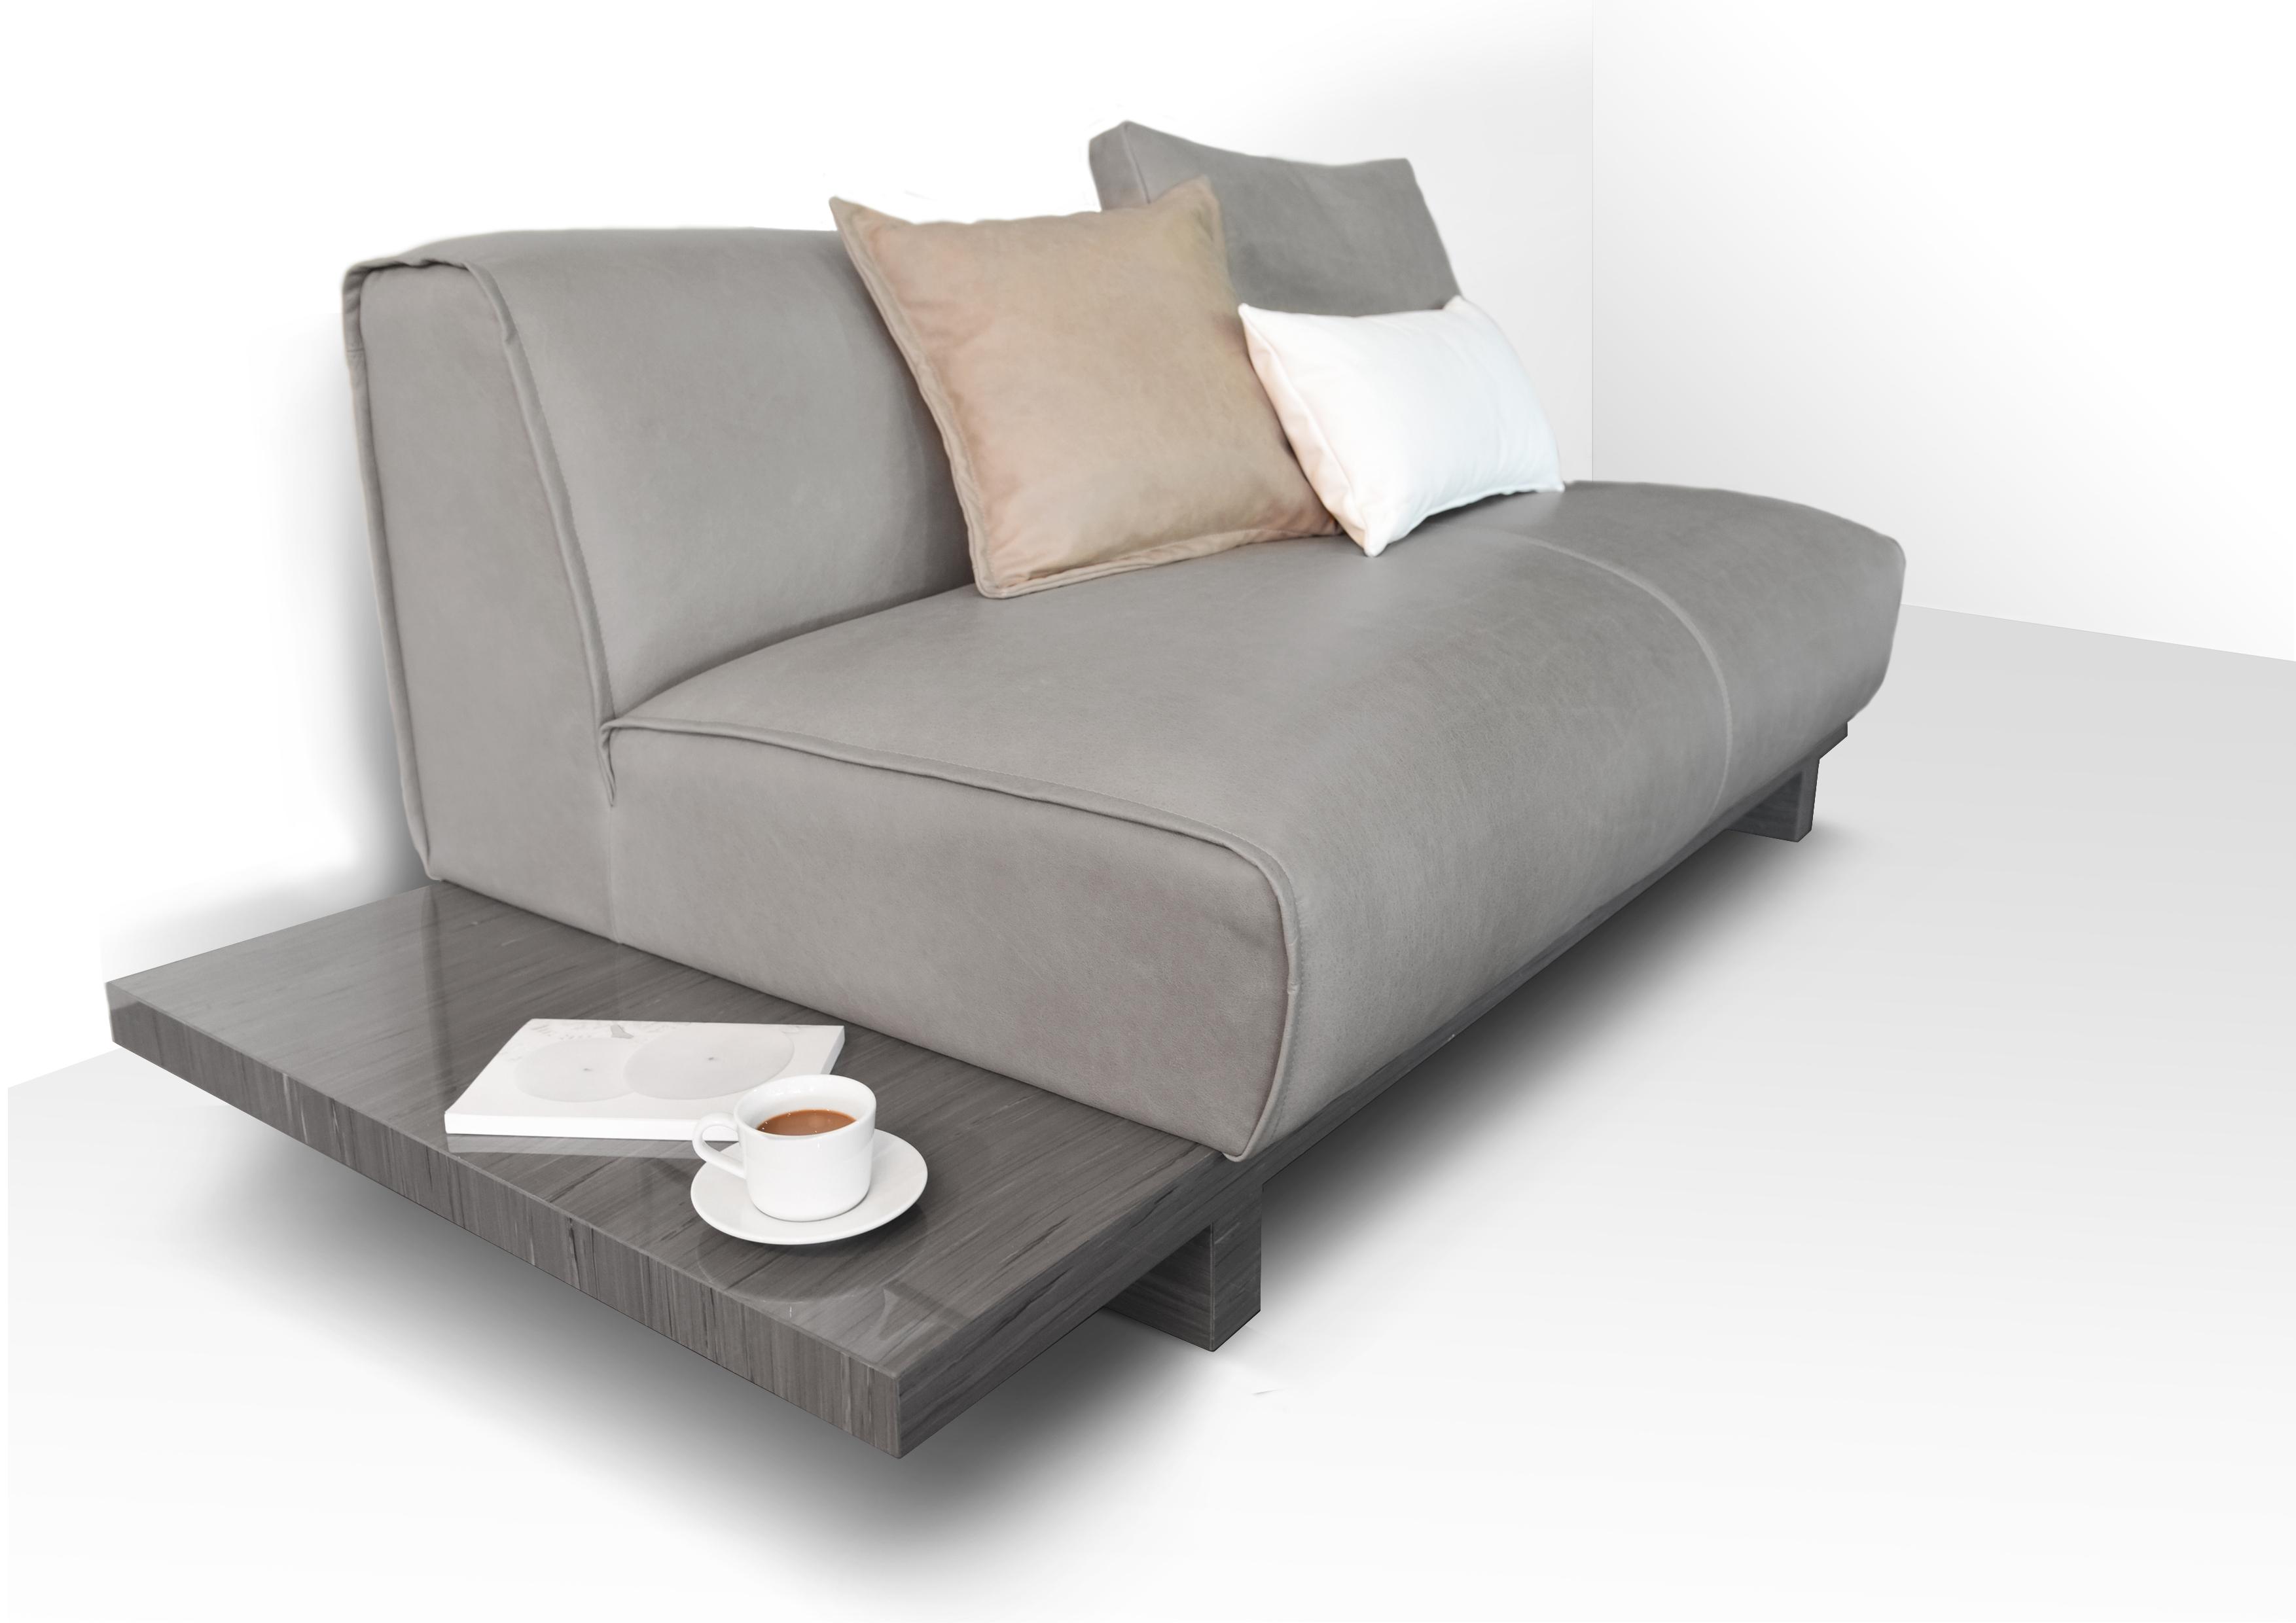 Mobella MOOF Sofa01